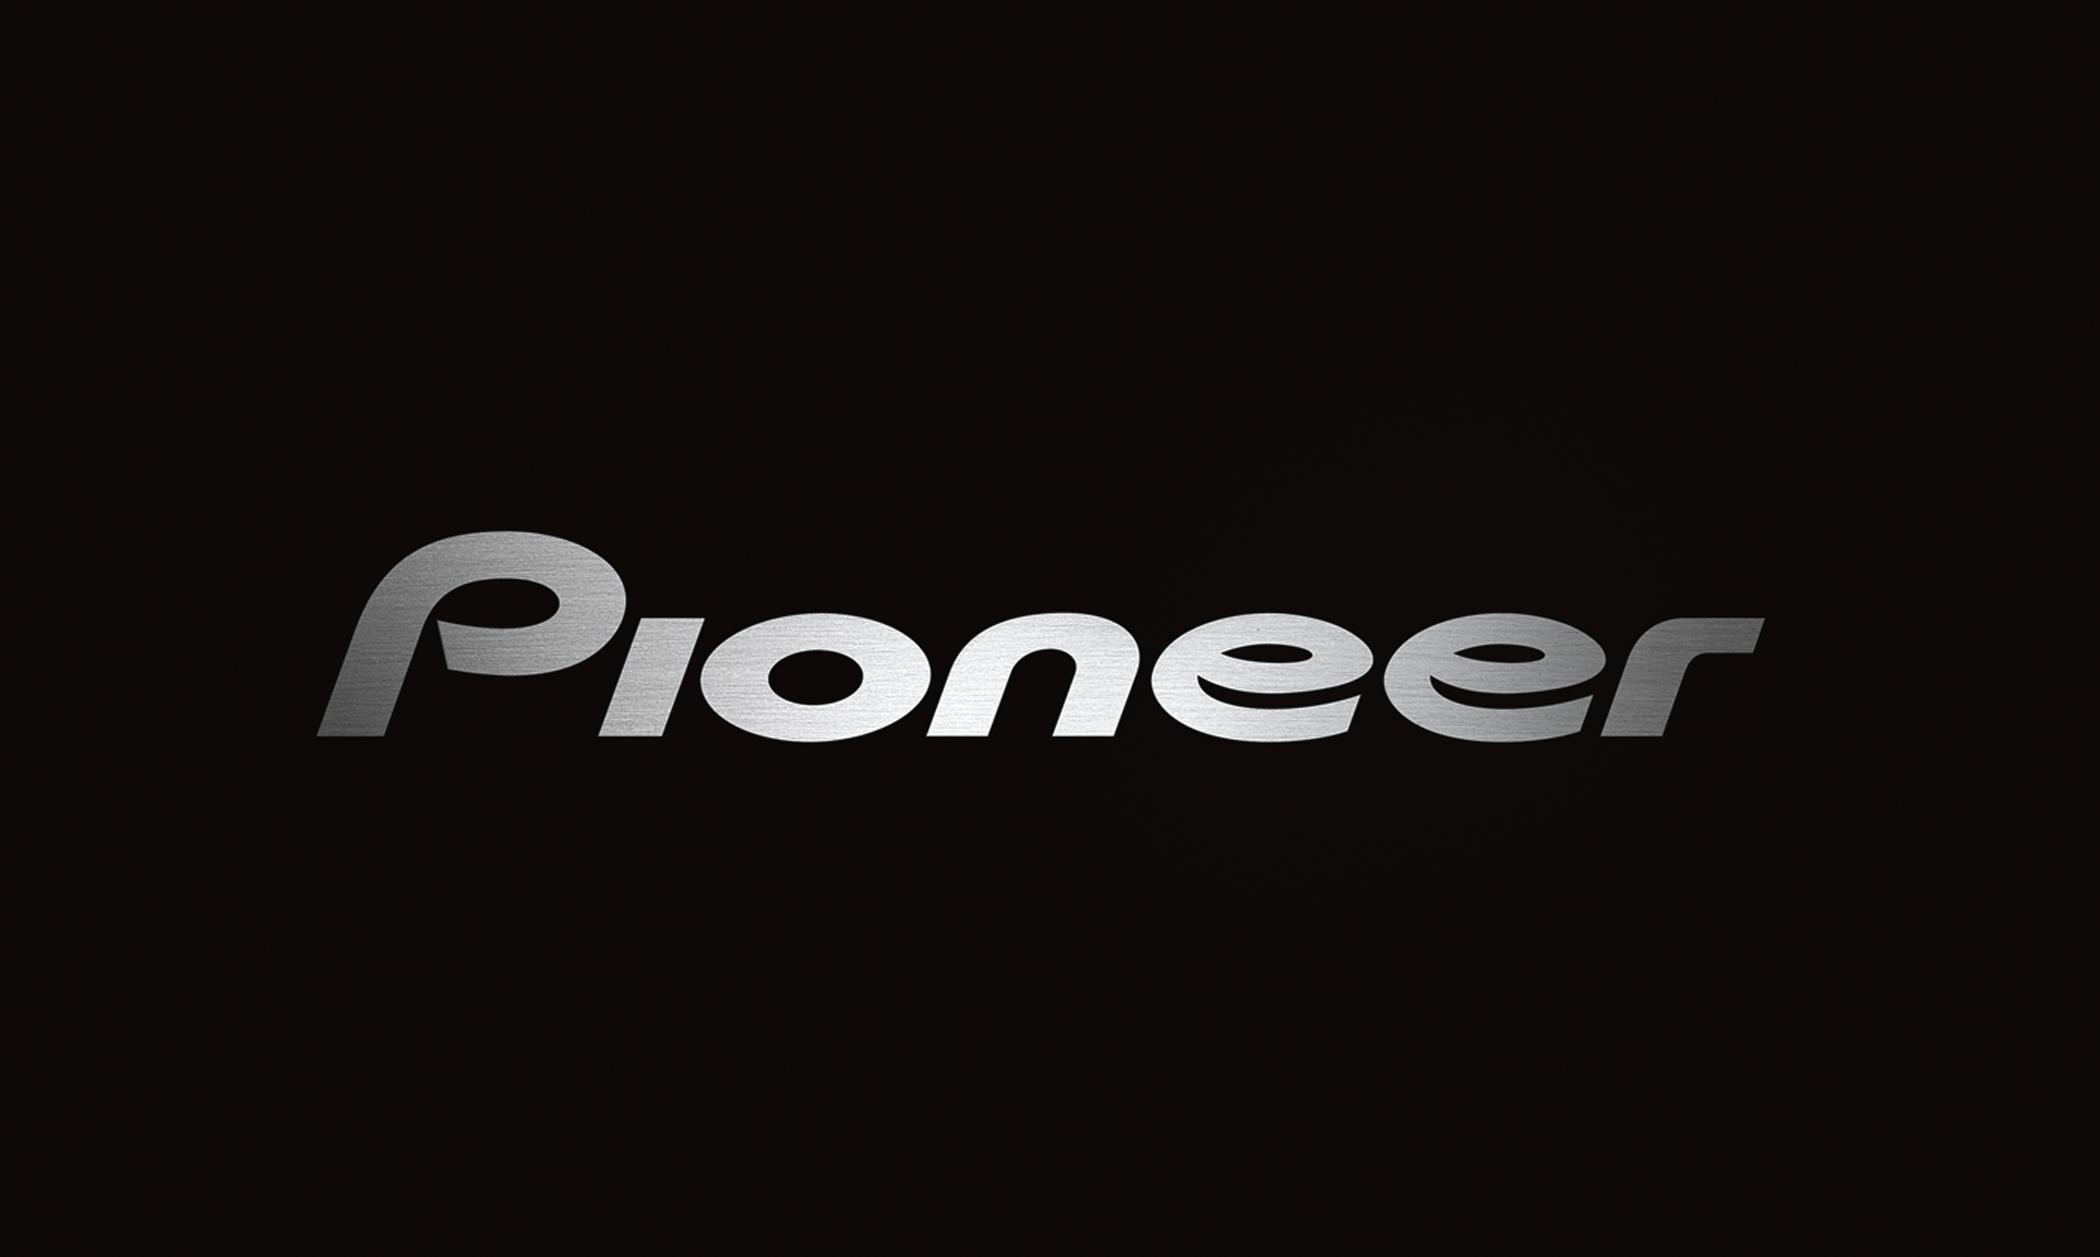 pioneer nhap khau